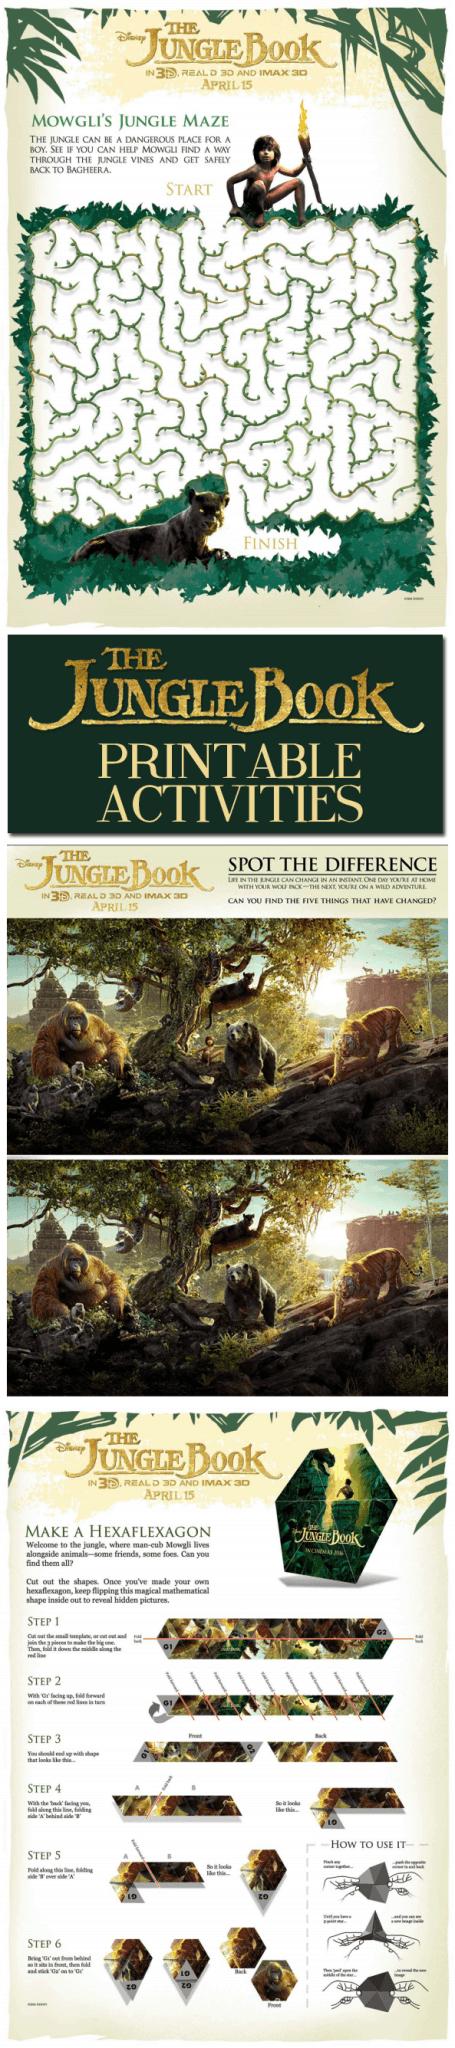 Jungle Book printable